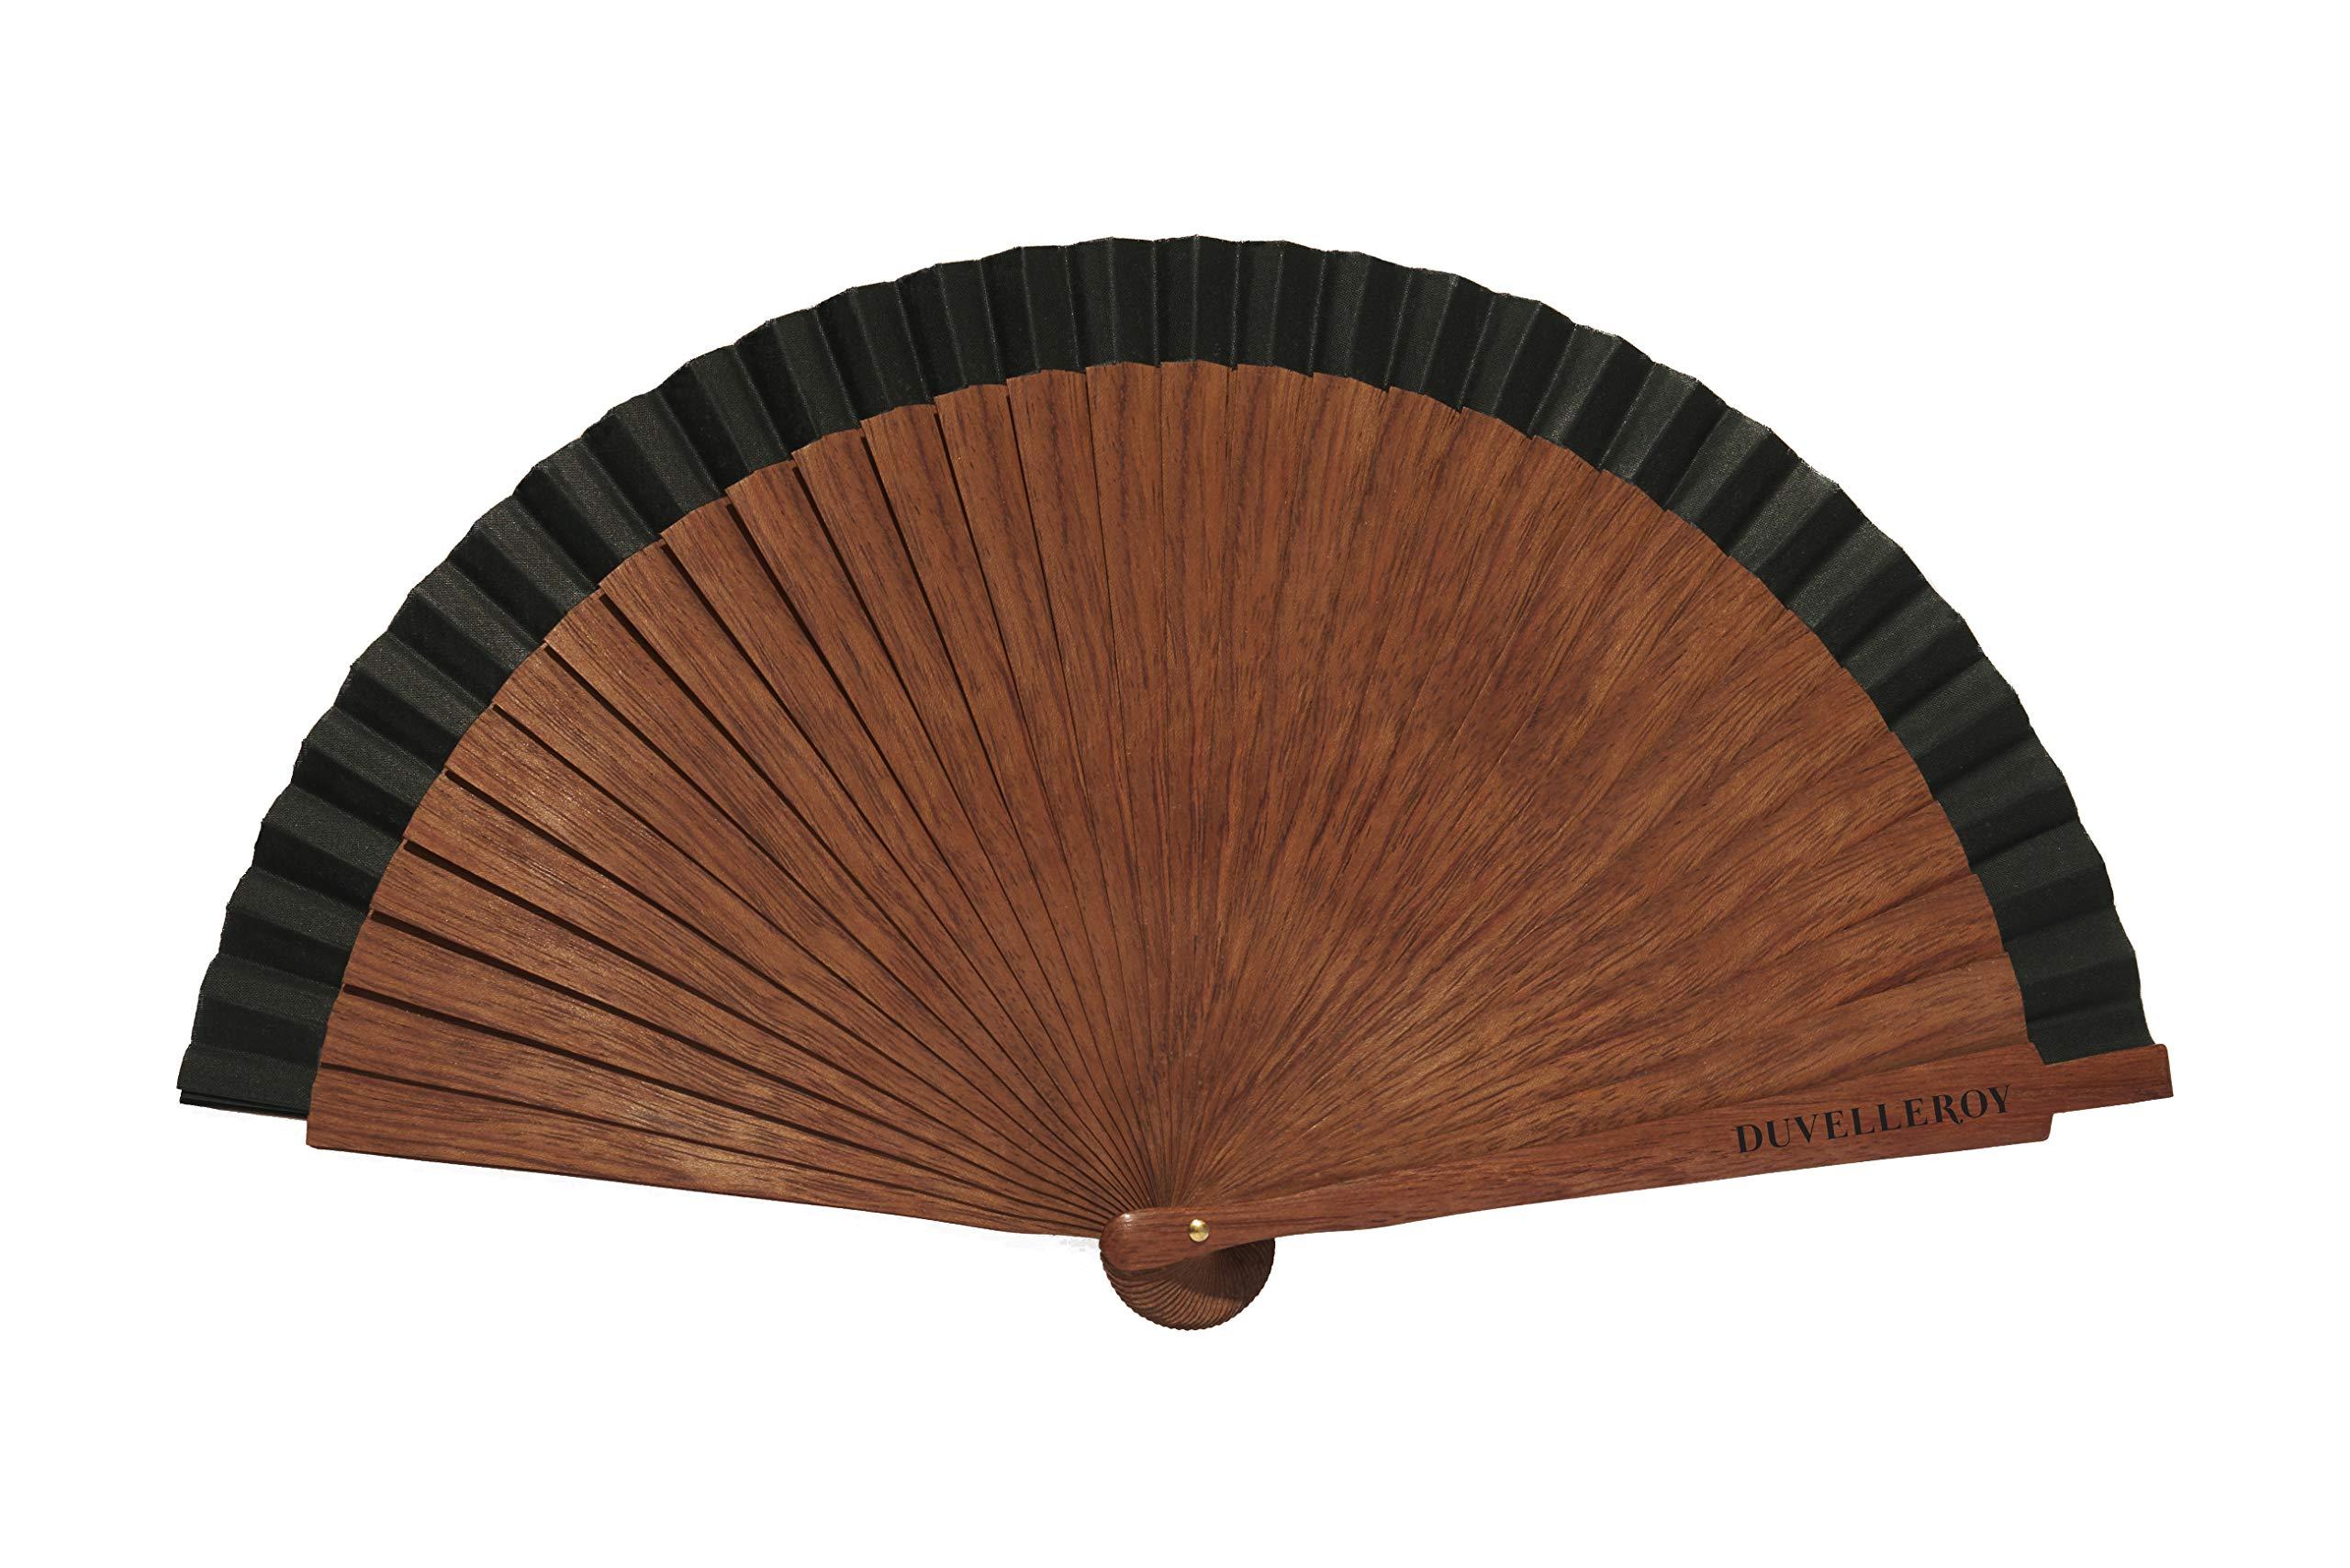 La Perfection Louis Pocket Hand Fan Bokapi Wood by DUVELLEROY Paris 1827 Made in France by La Perfection Louis (Image #1)